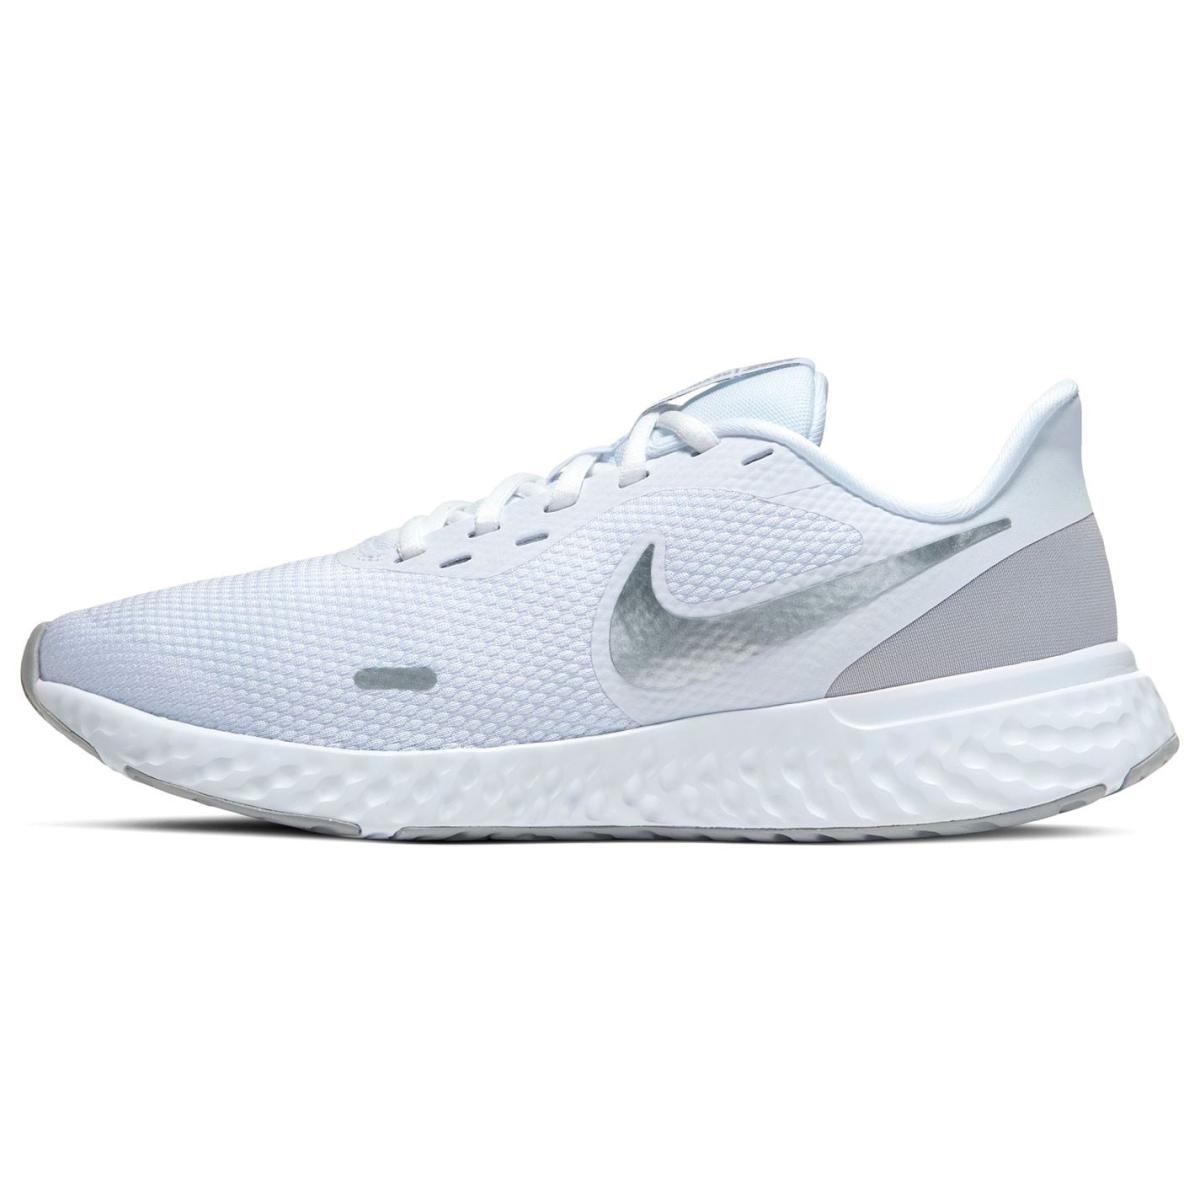 Nike-Revolution-Turnschuhe-Damen-Sneaker-Sportschuhe-Laufschuhe-1160 Indexbild 56